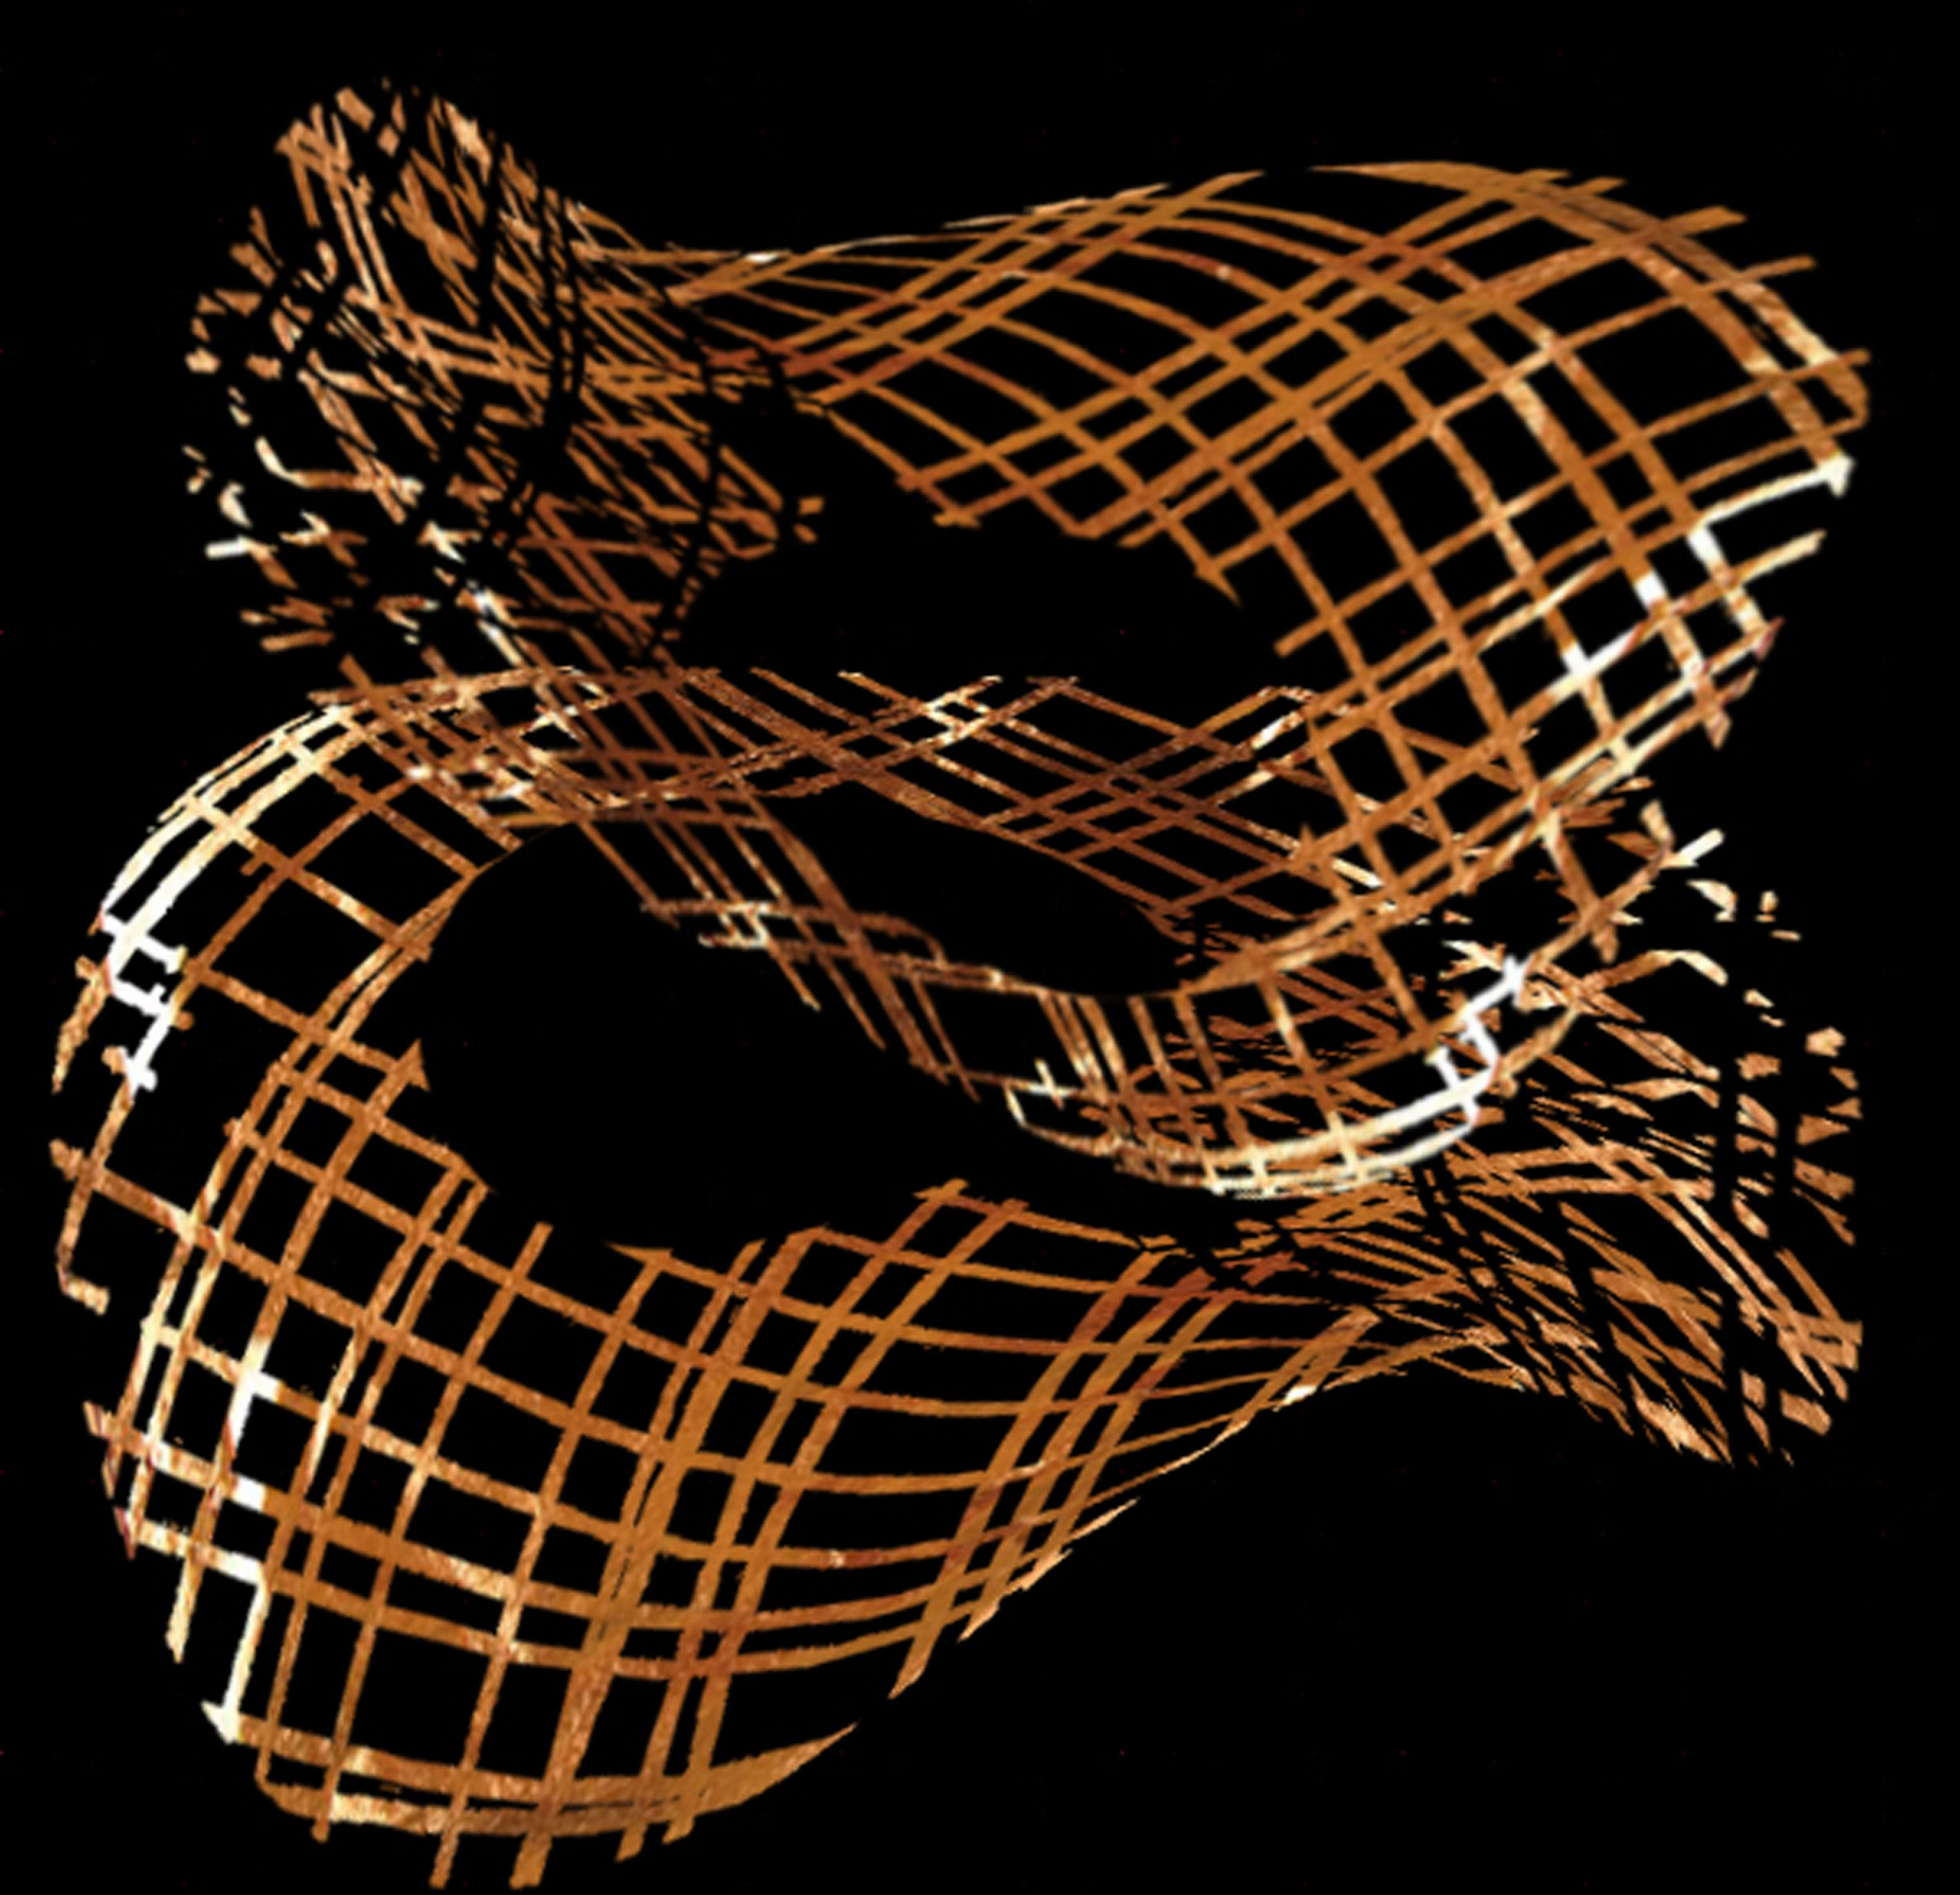 """Weave"", Verre Eglomise in 22k genuine gold leaf"